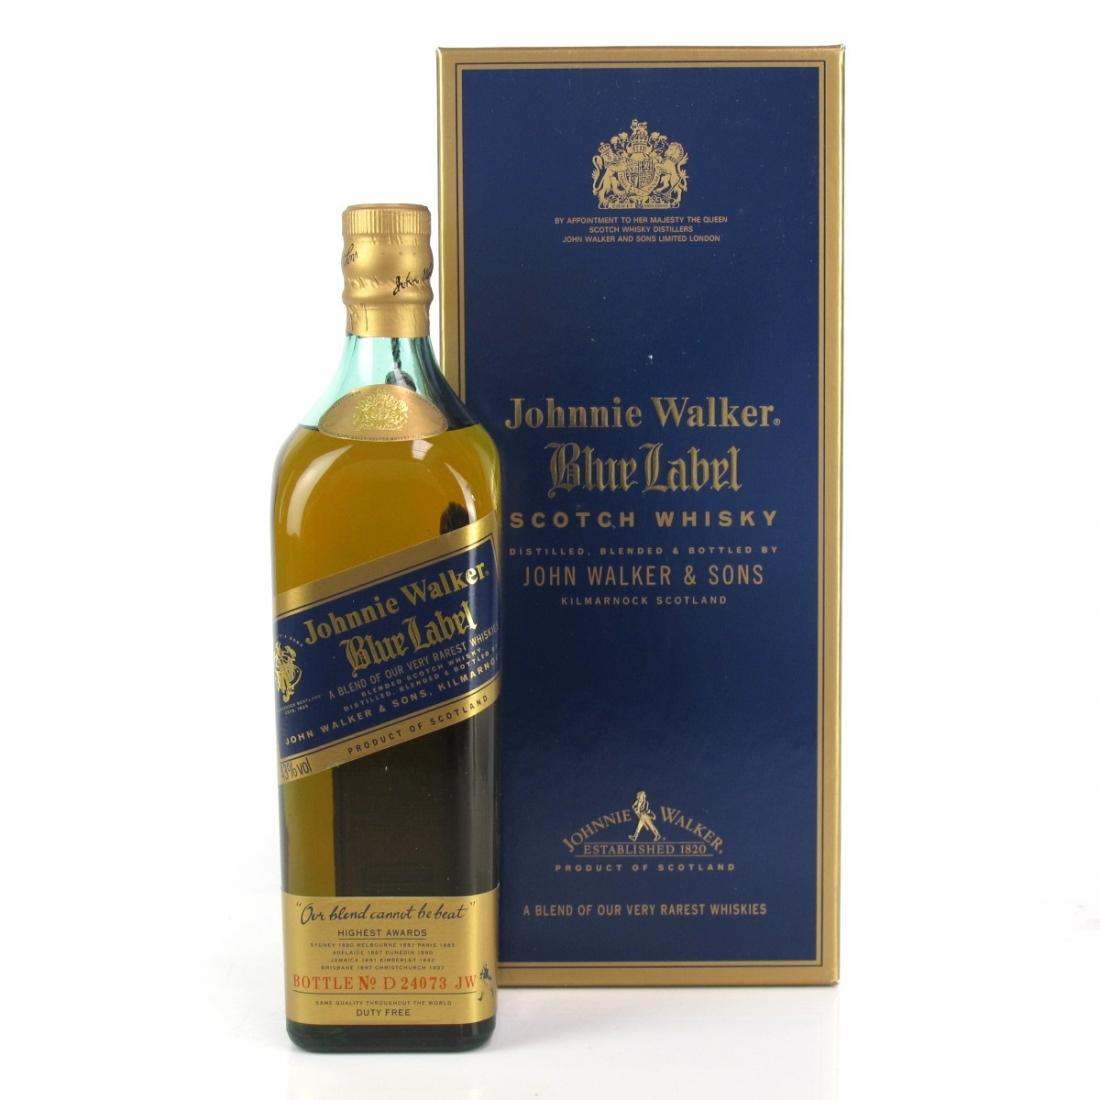 Johnnie Walker Blue Label 75cl